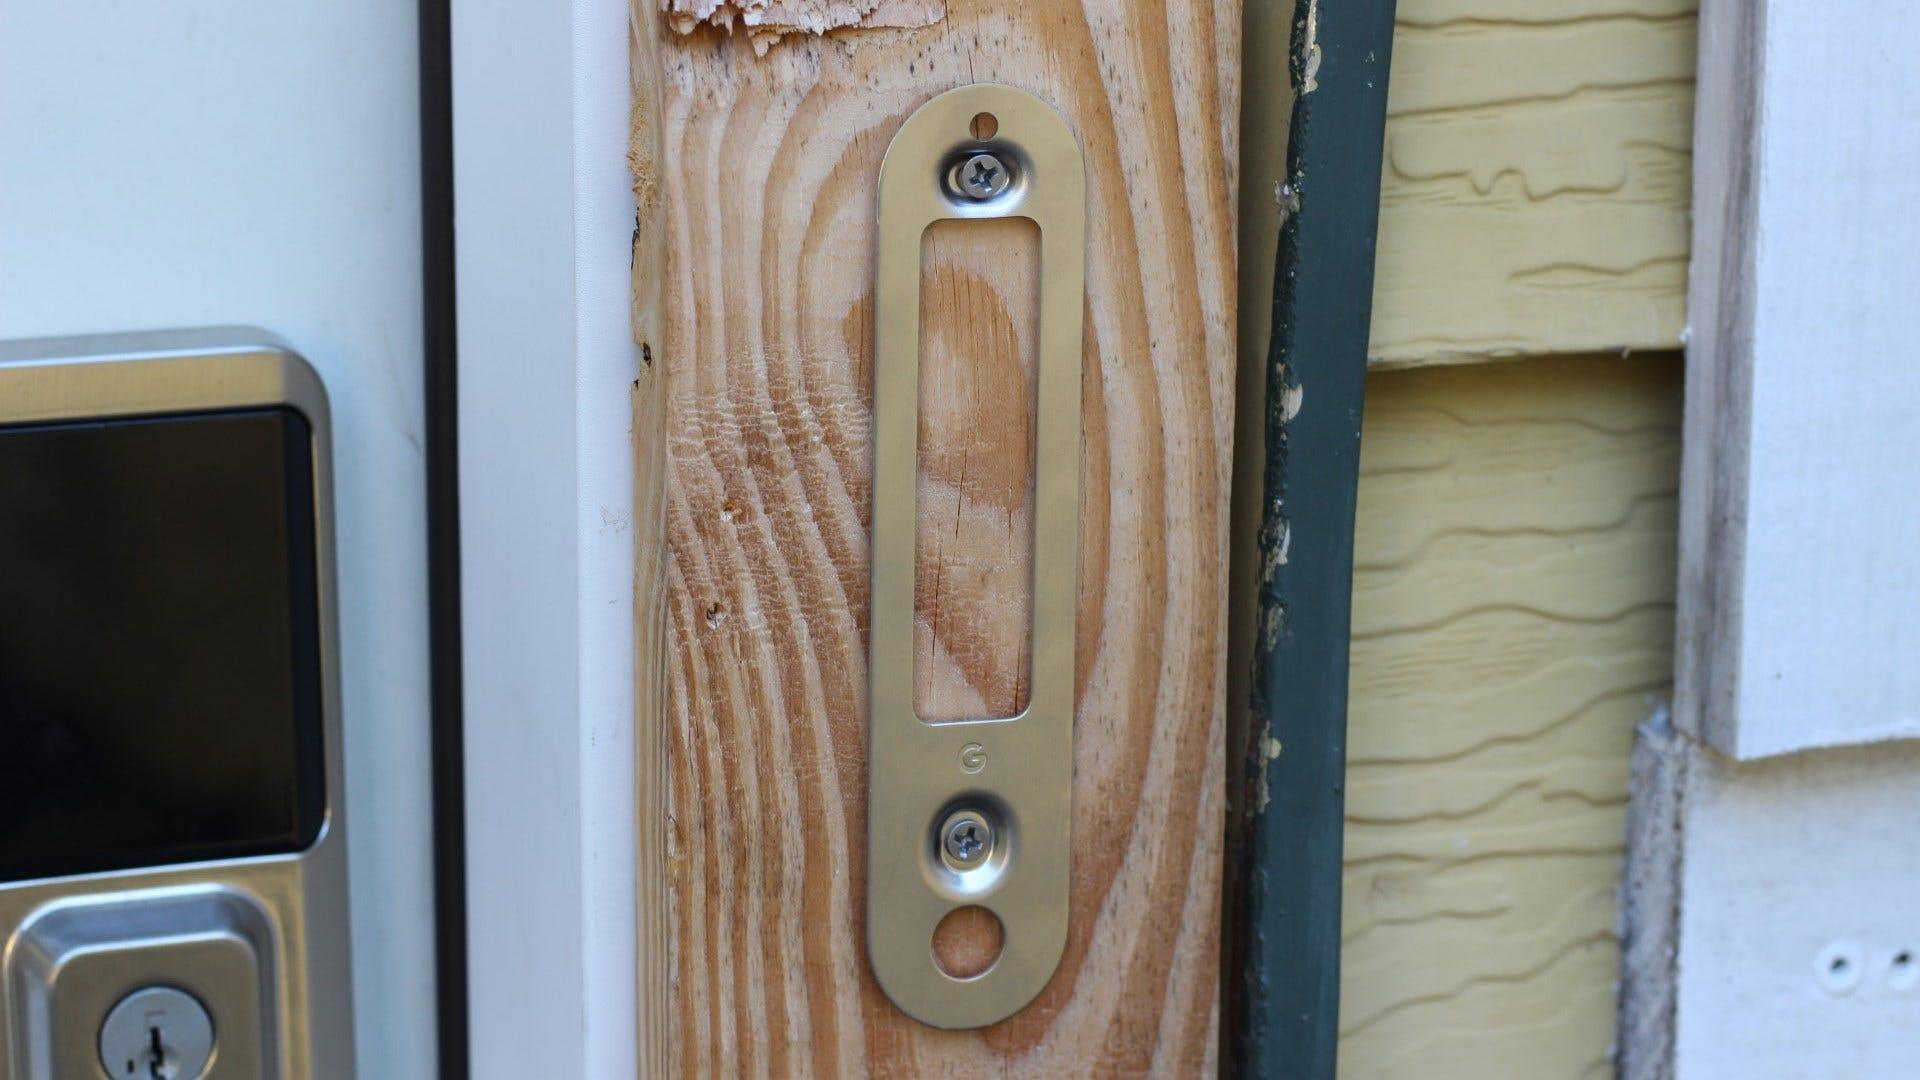 Nest Doorbell (battery) mounting bracket